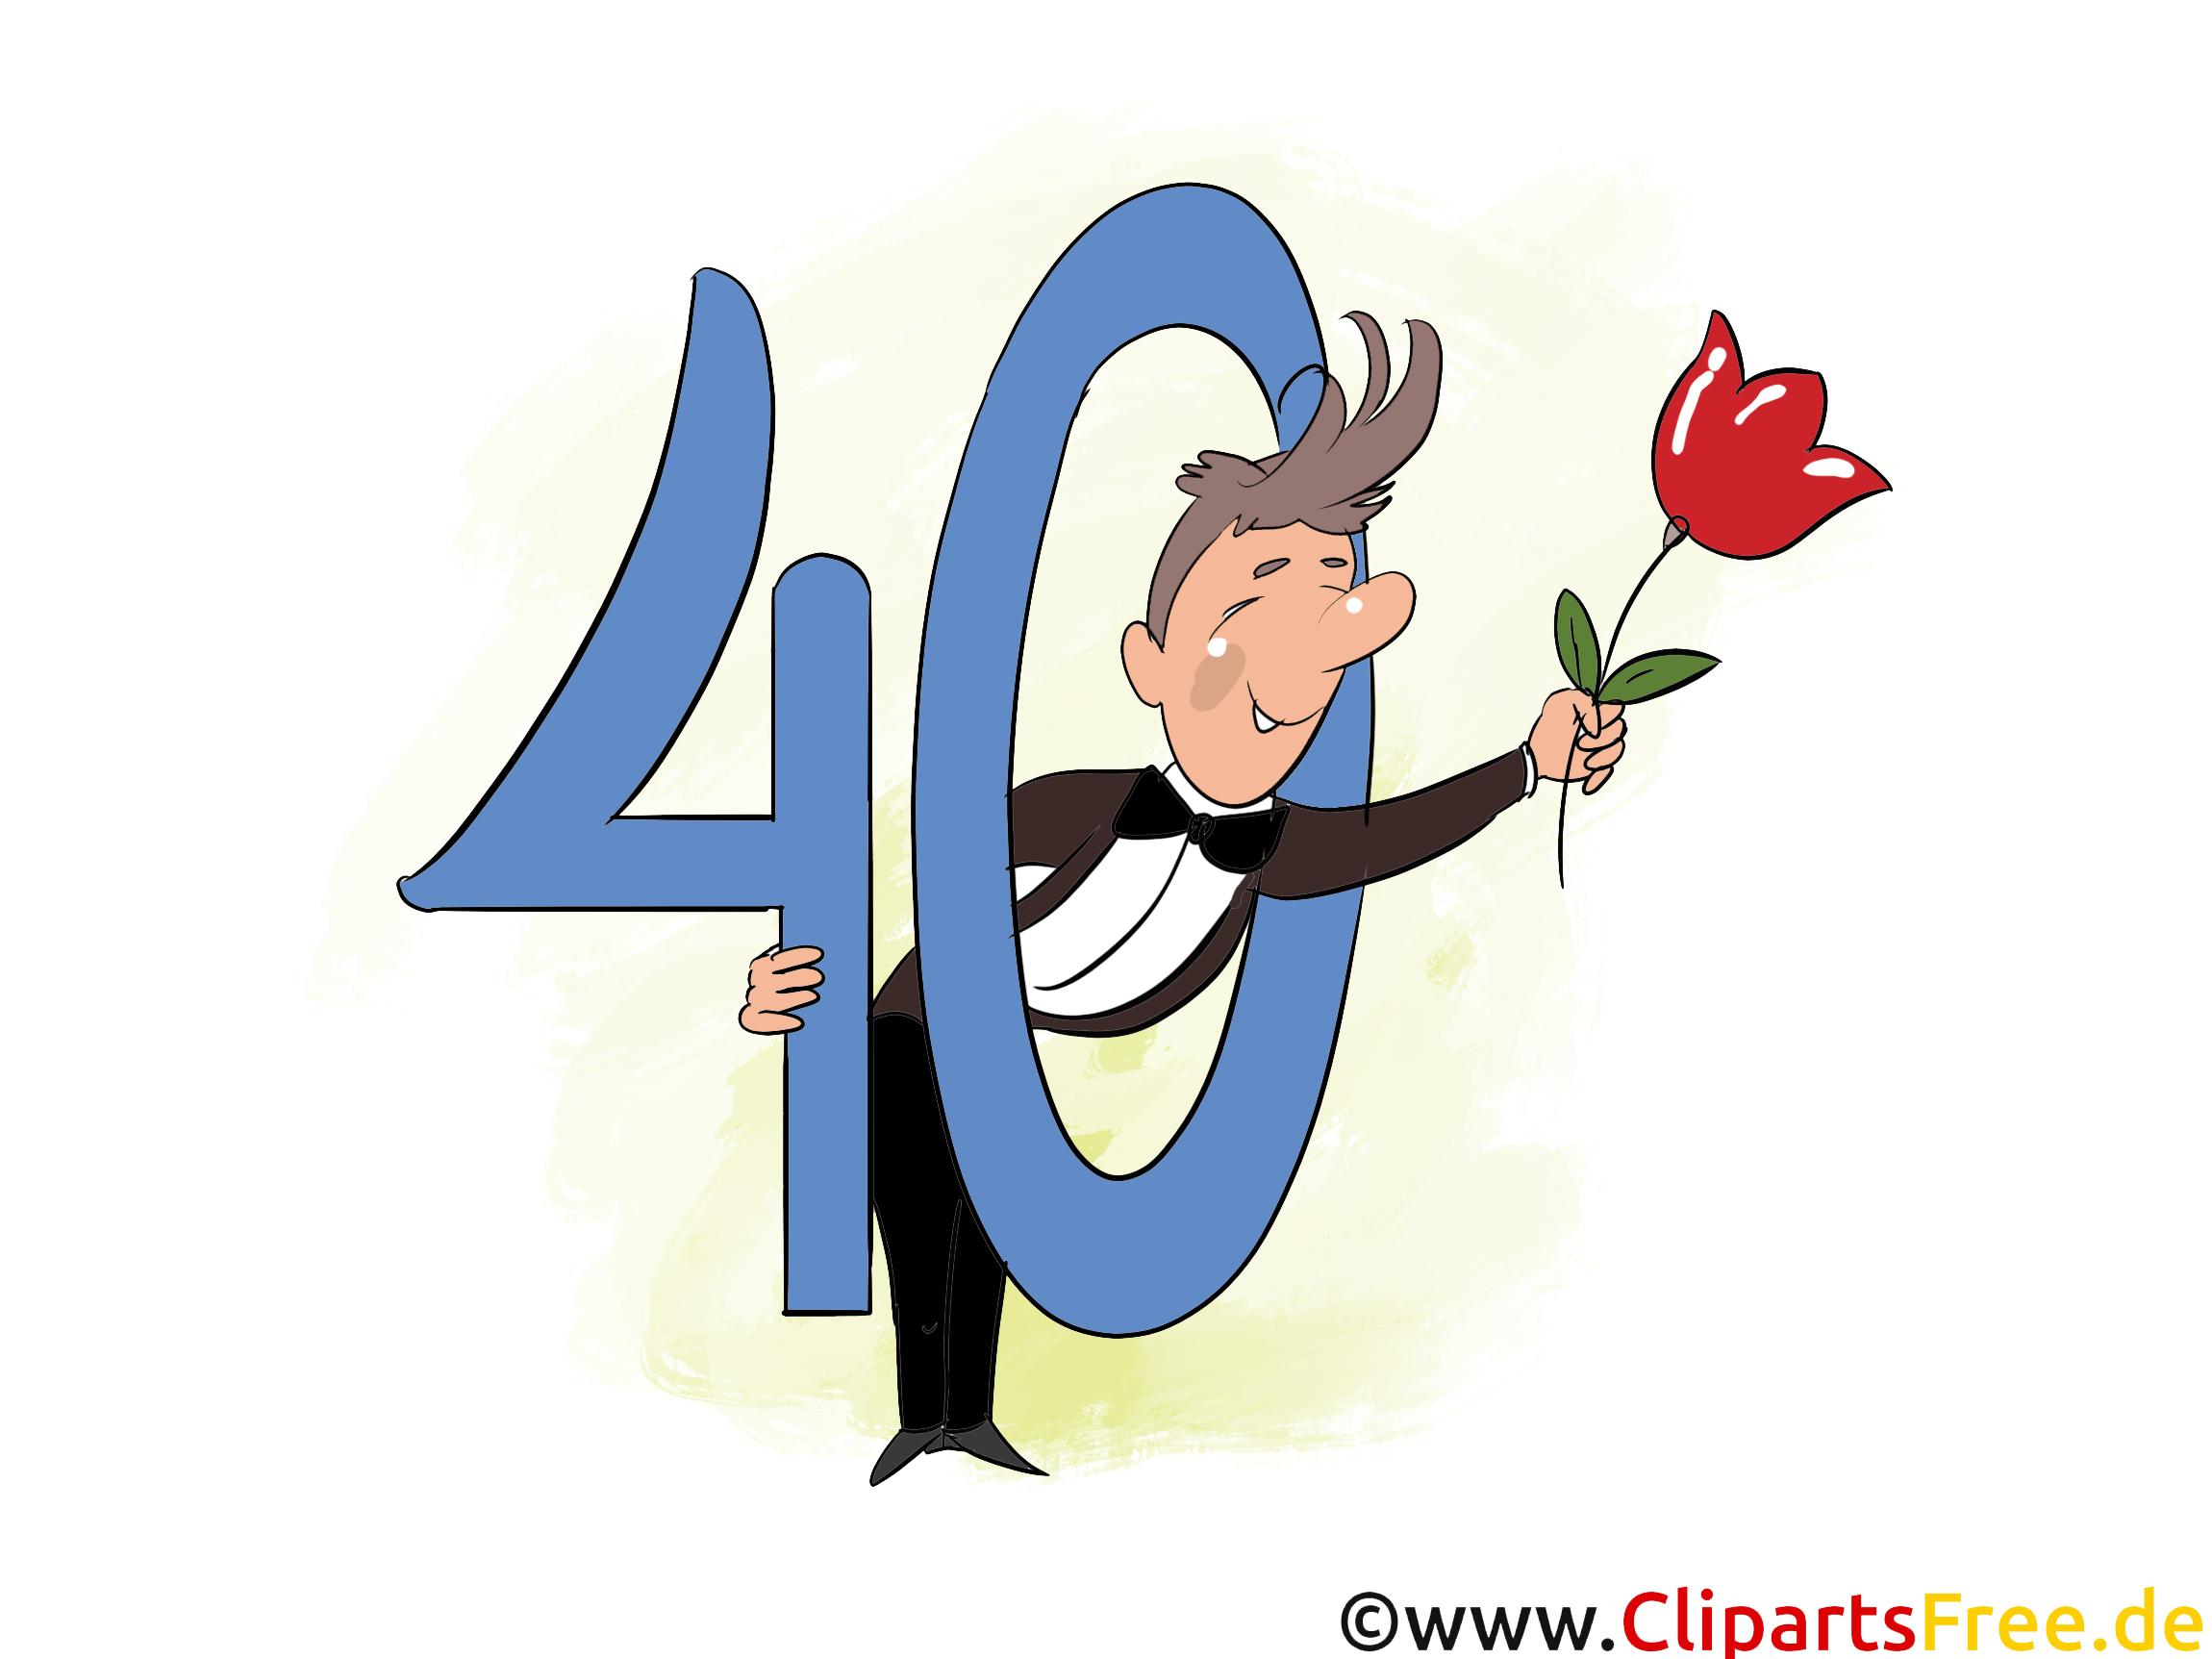 e-card 40 jahre geburtstagsgruss, glückwunsch, gratulation, Einladungen